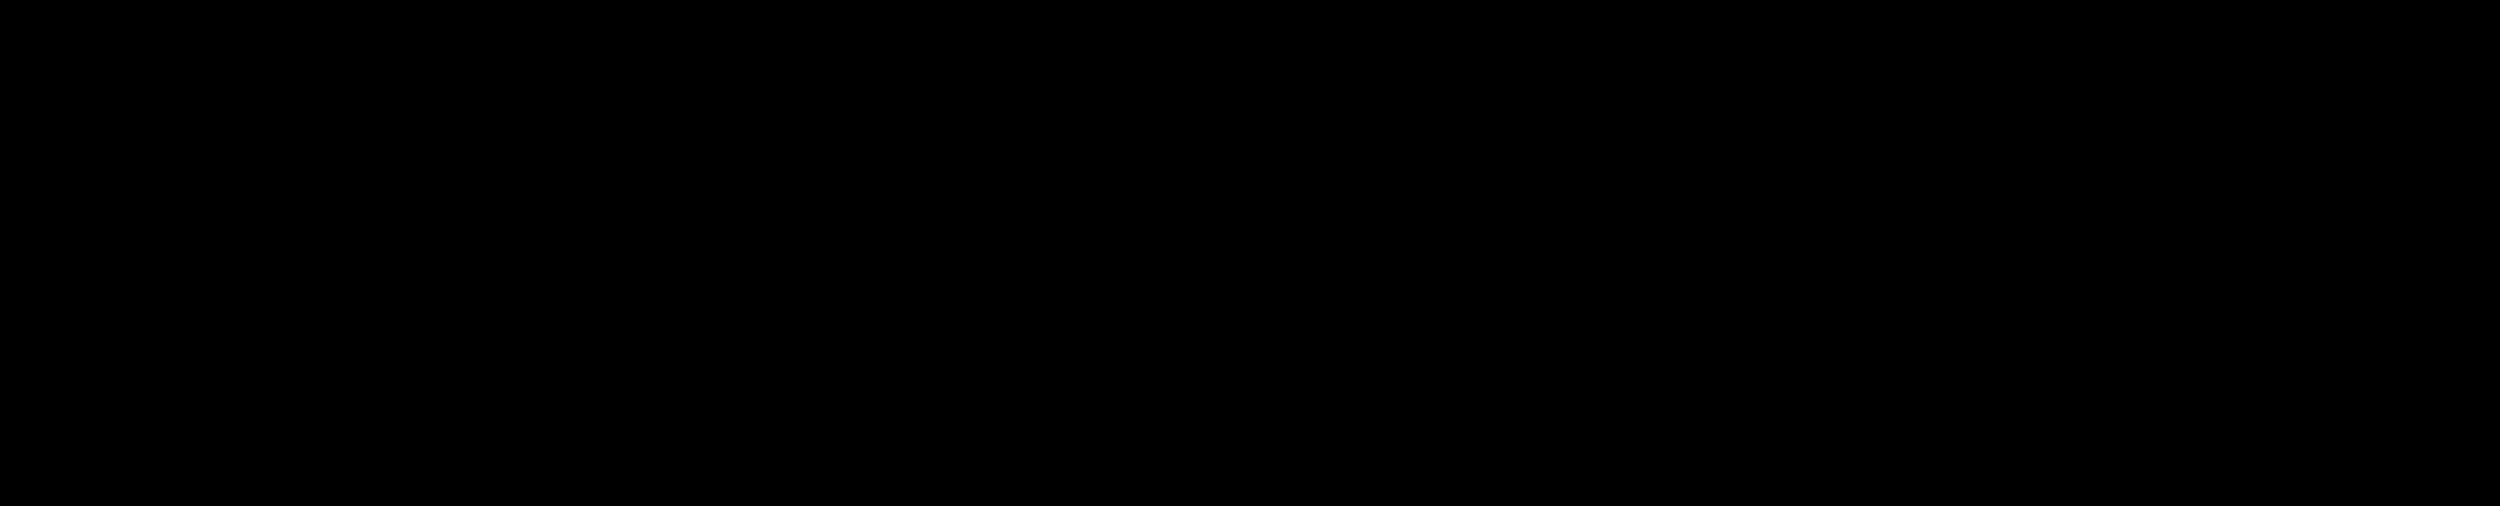 Columbia_logo_logotype_wordmark.png